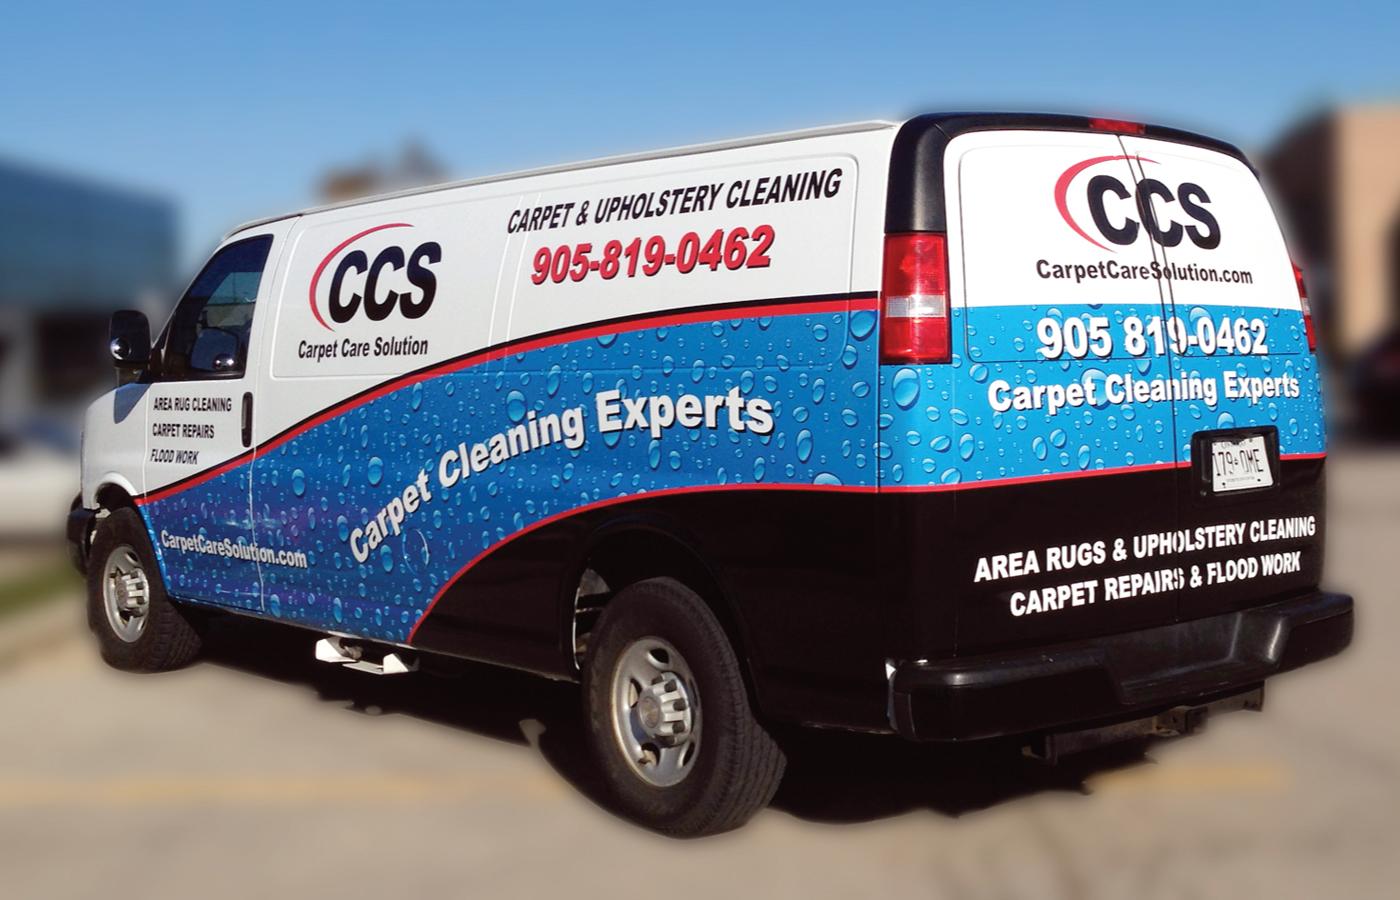 3m commercial vehicle wraps vehicle graphics mississauga. Black Bedroom Furniture Sets. Home Design Ideas